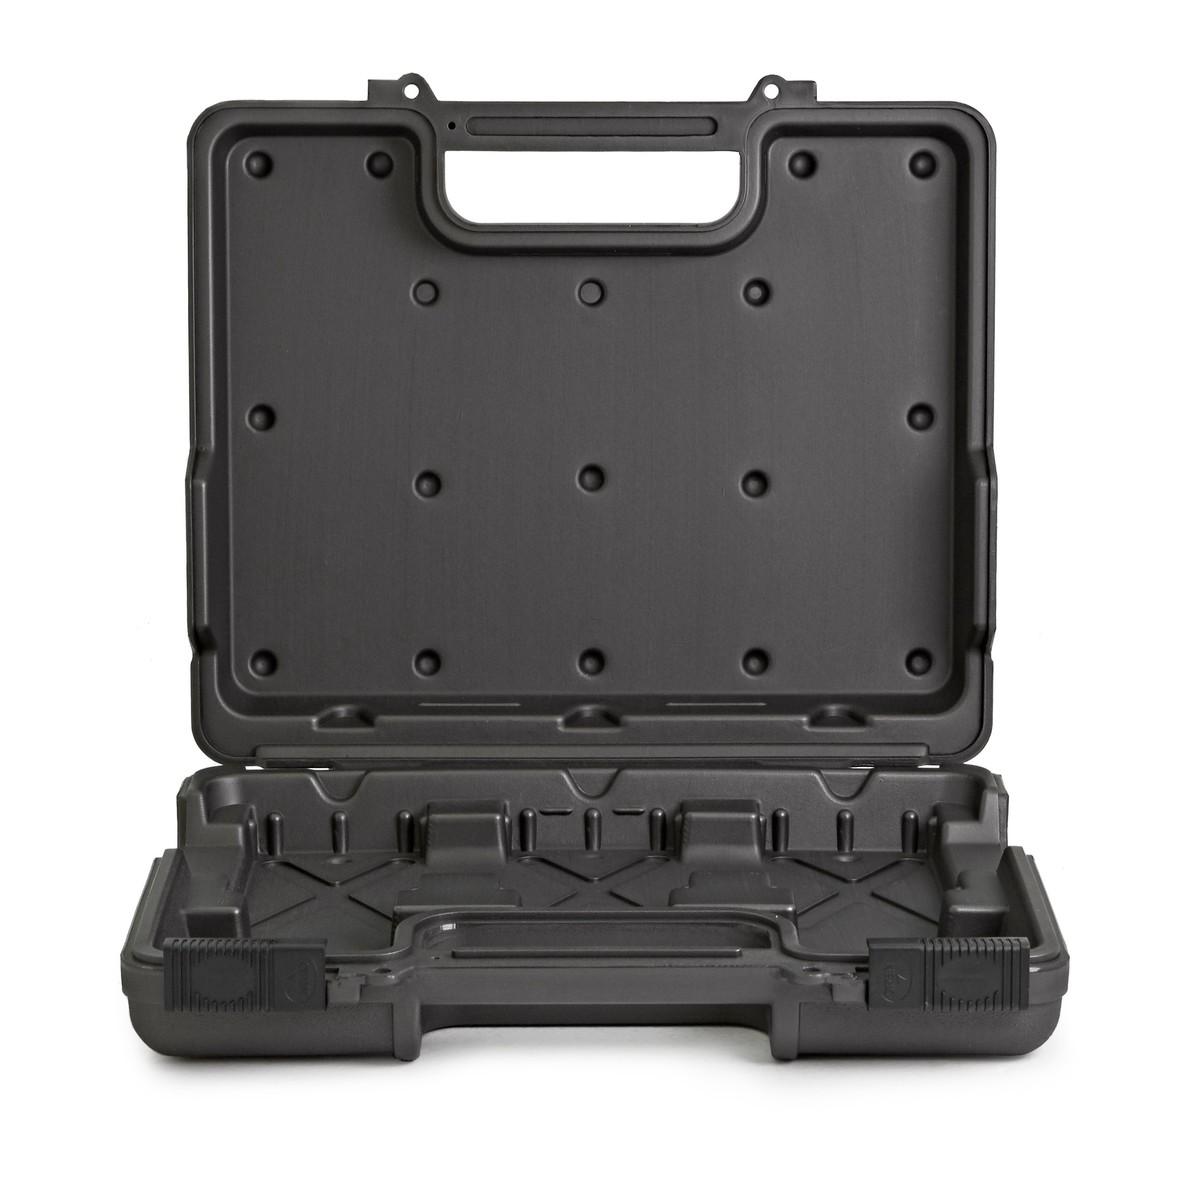 Boss BCB-30 Compact Pedal Board